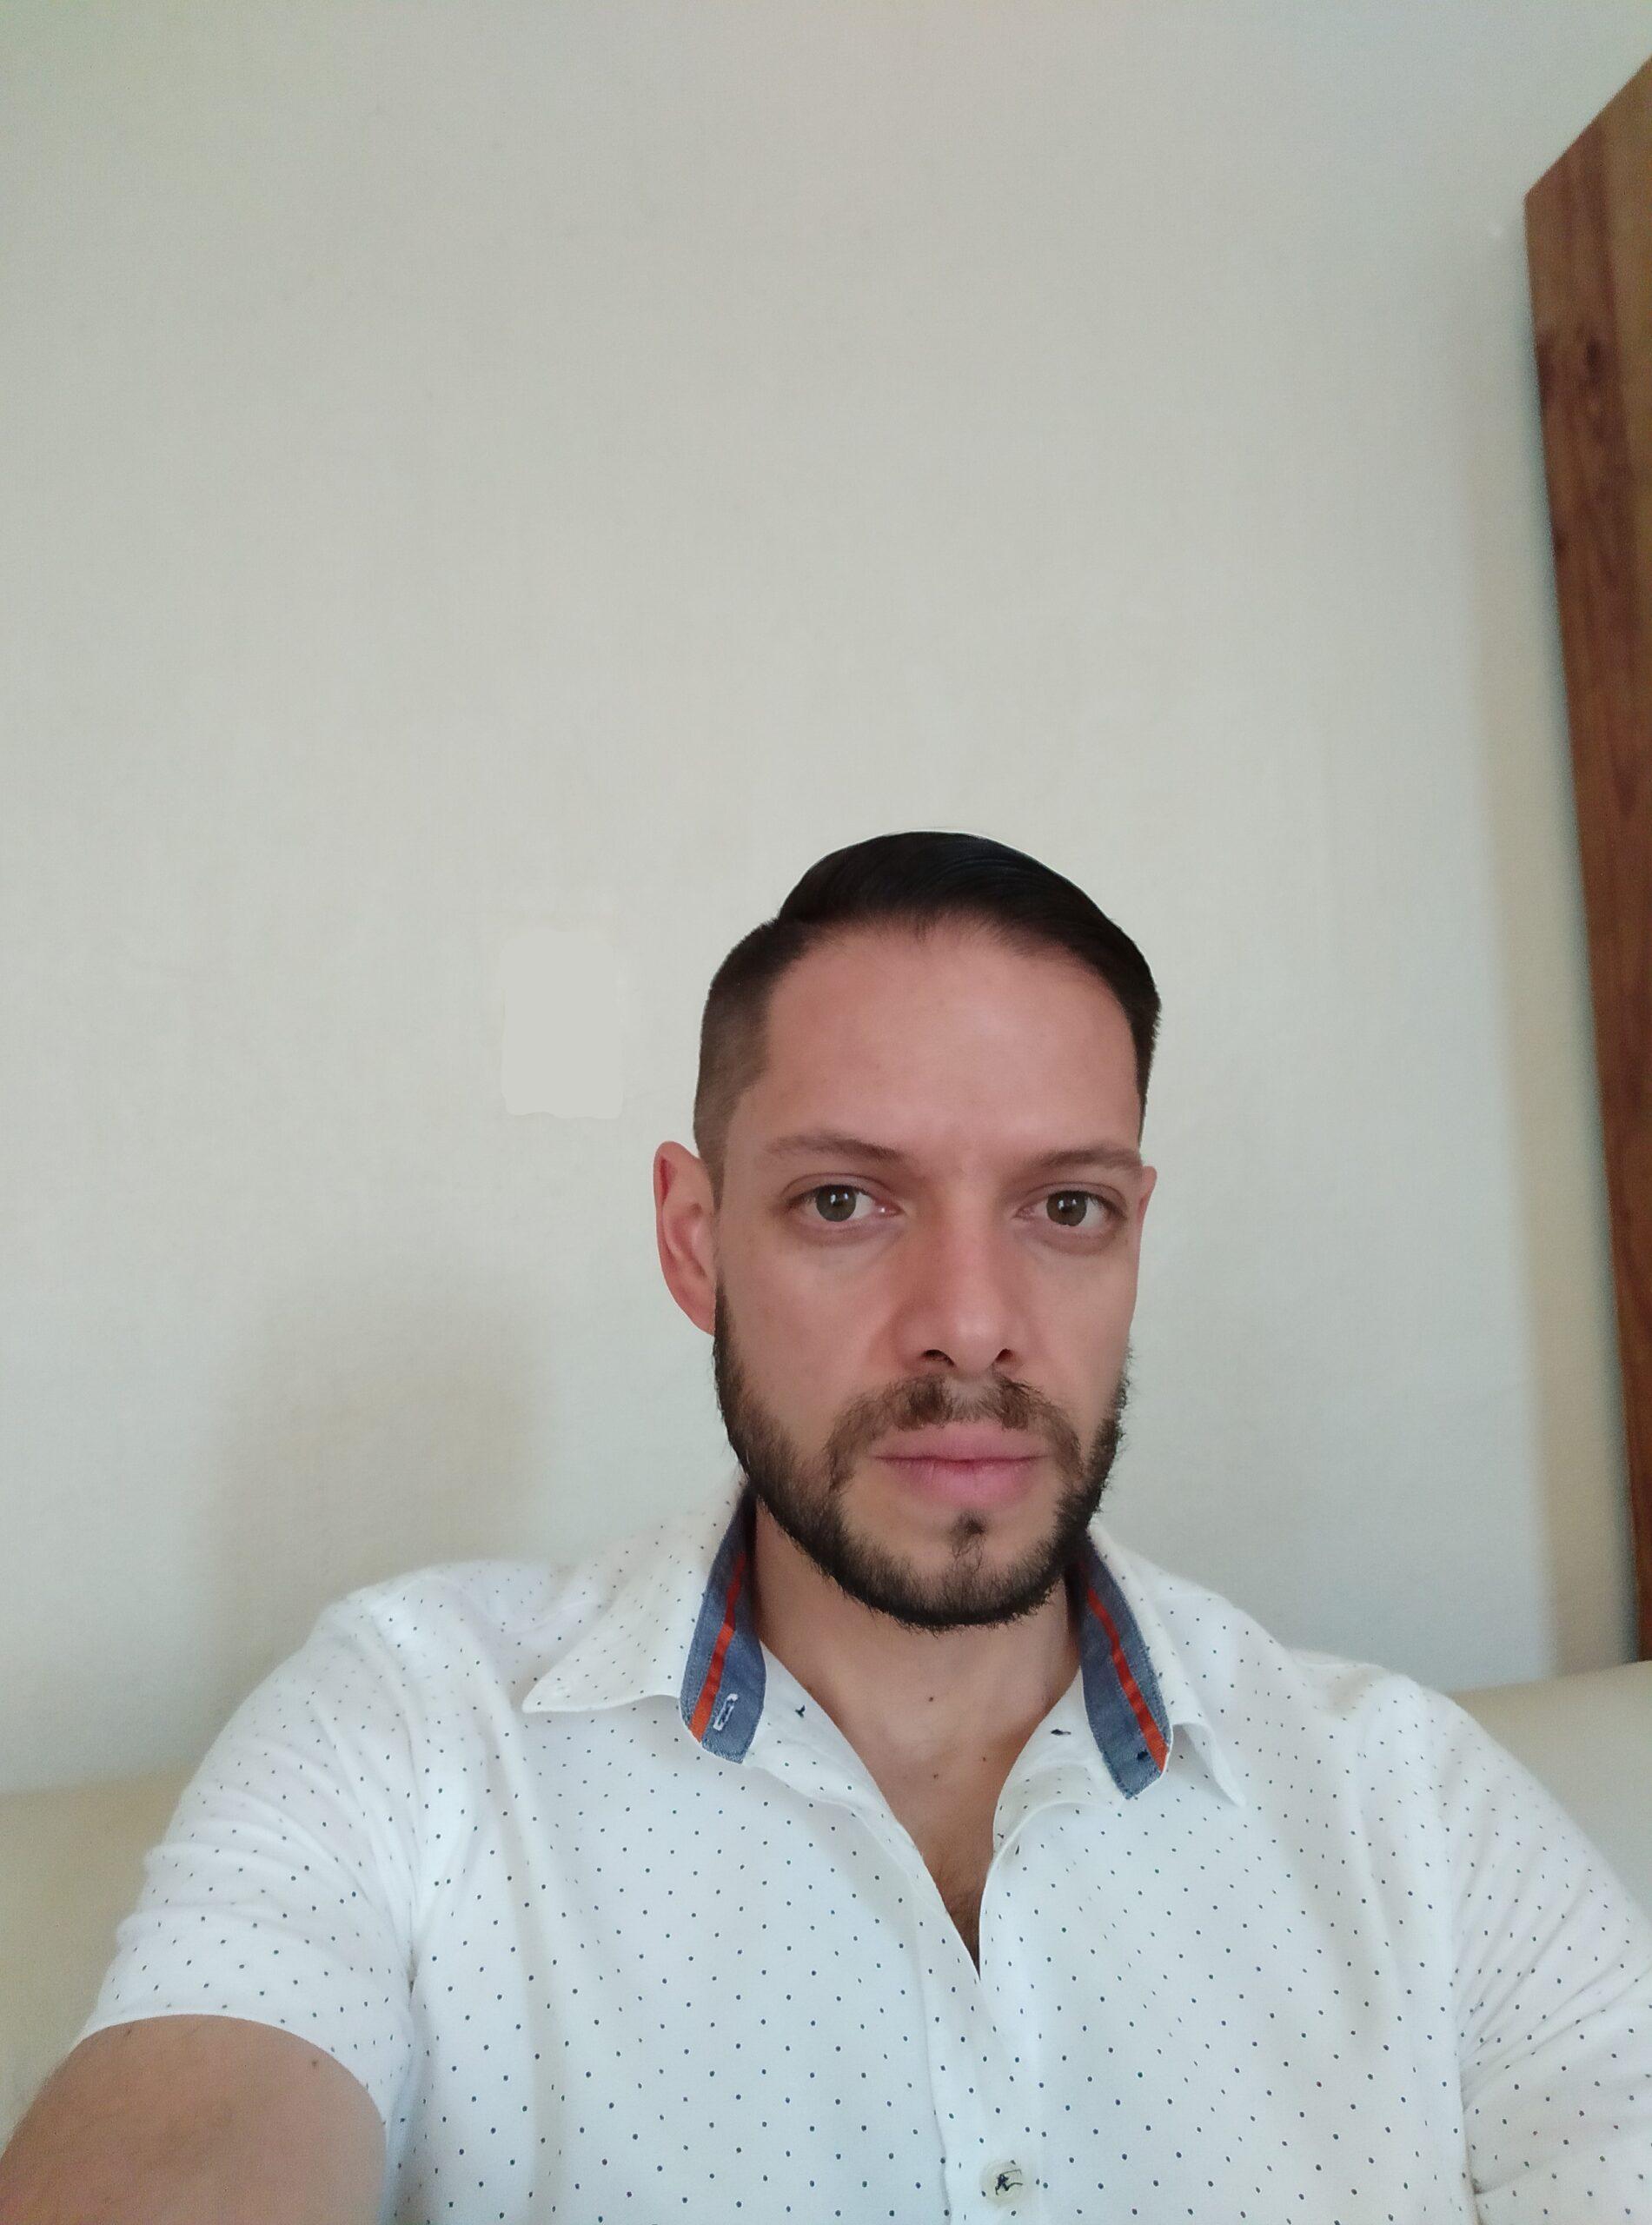 José Daniel Vargas Gollaz